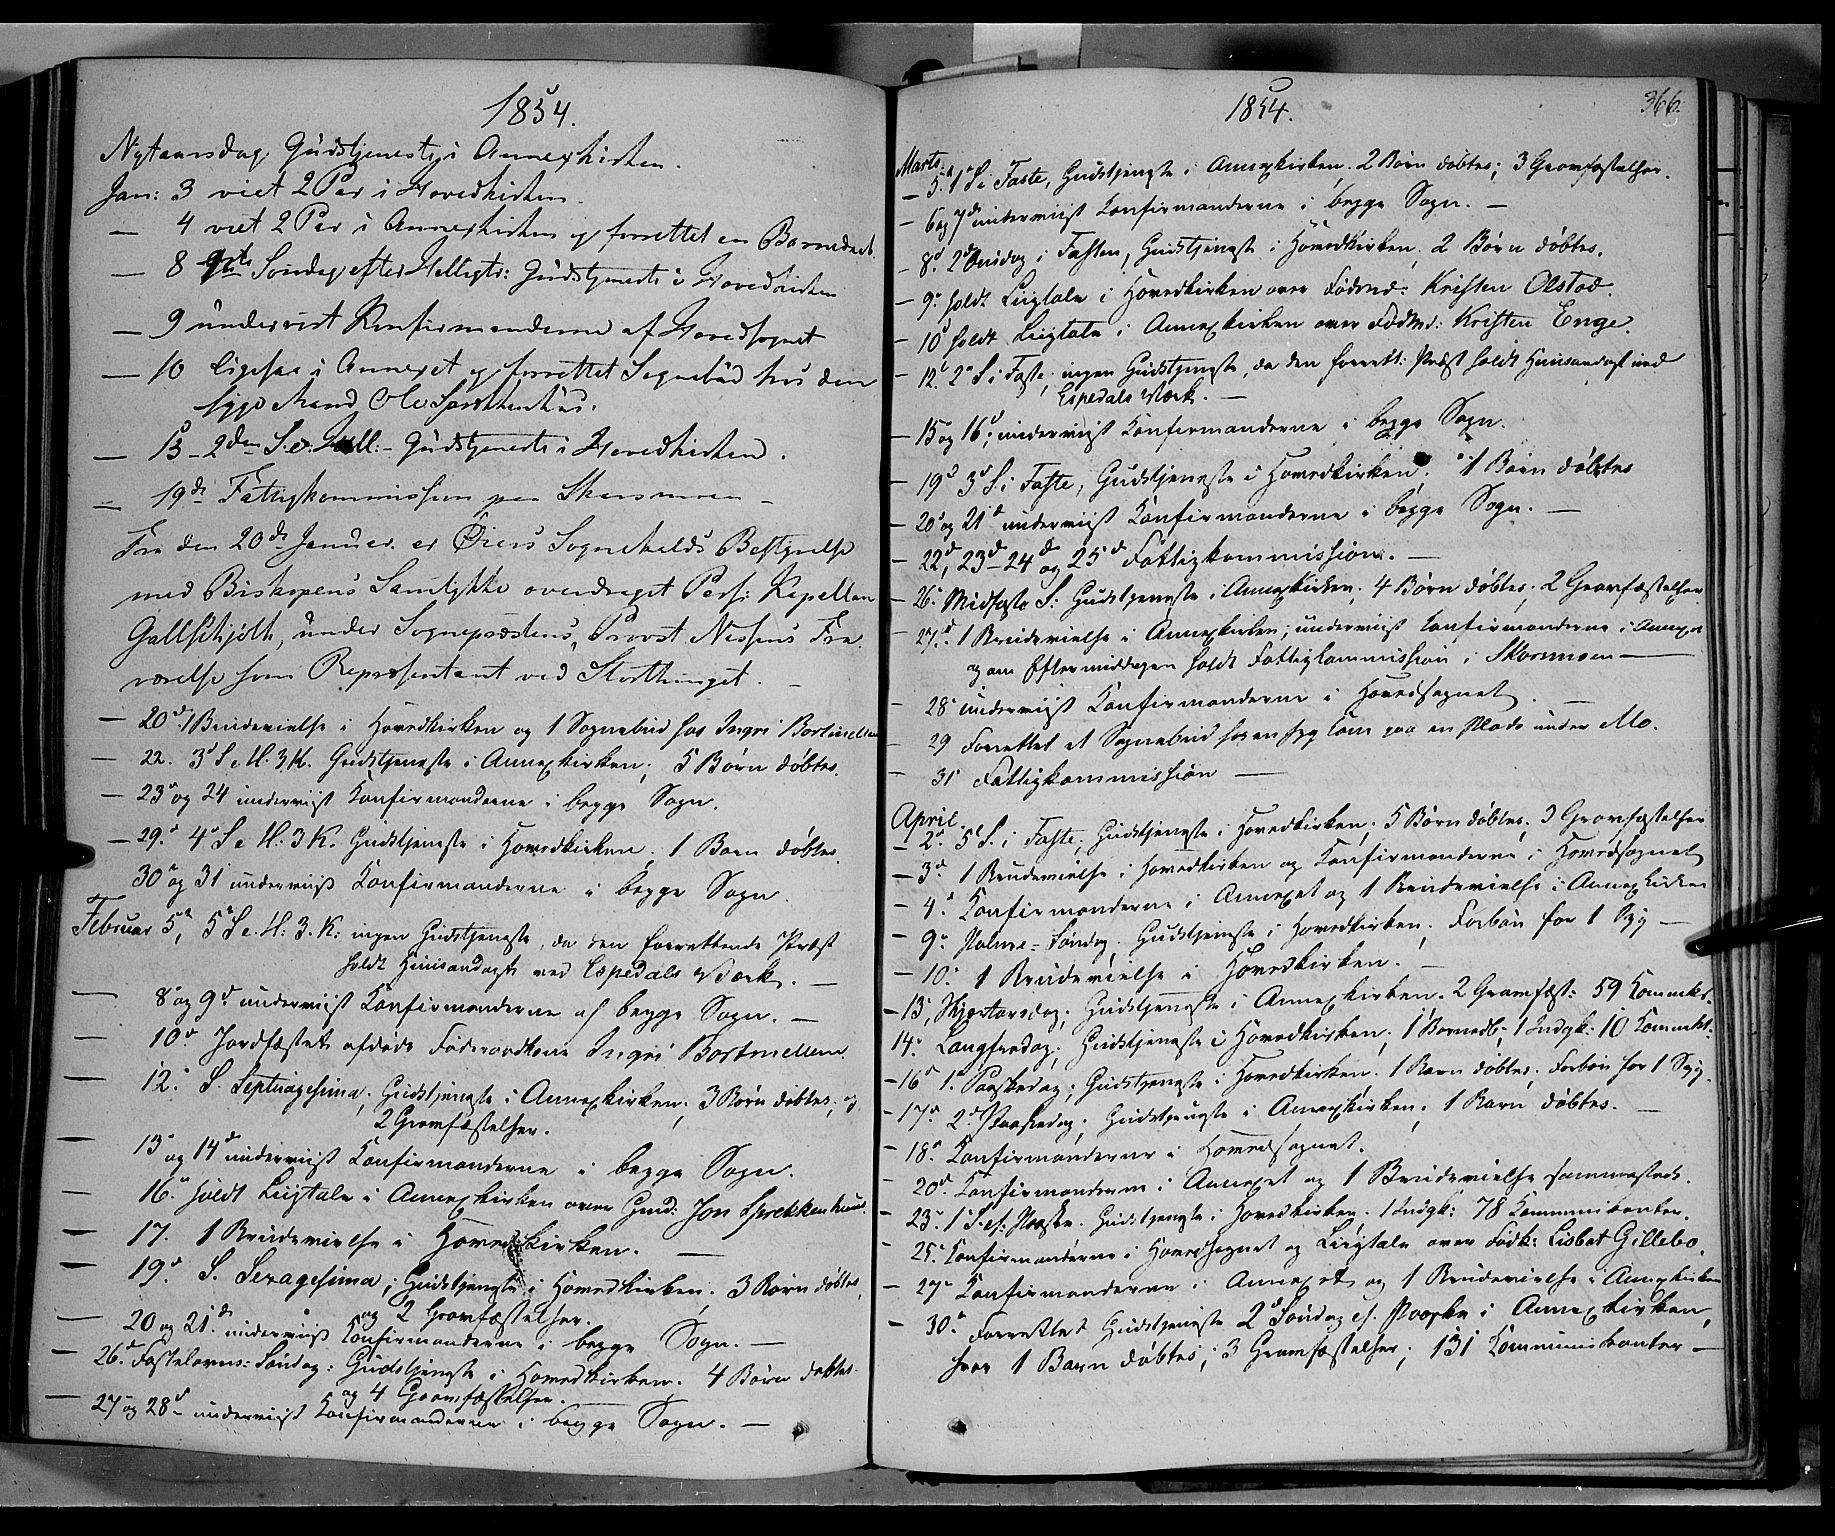 SAH, Øyer prestekontor, Ministerialbok nr. 5, 1842-1857, s. 366